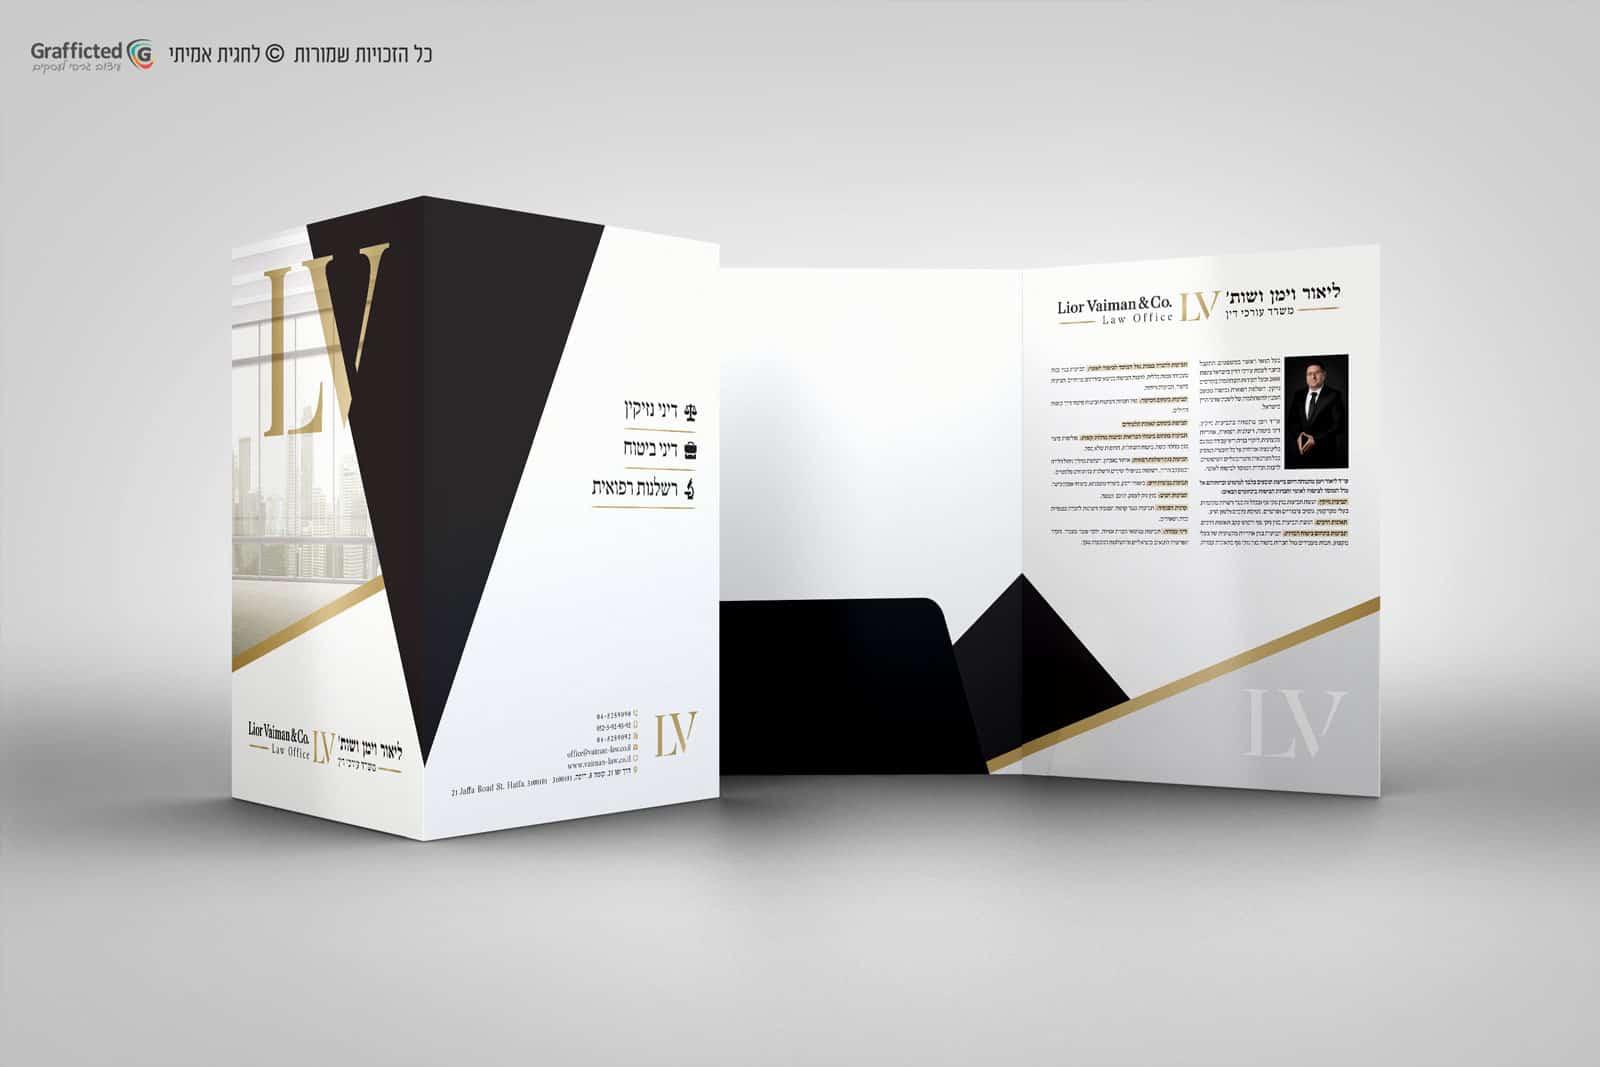 עיצוב פולדר לעורכי-דין עבור עורך דין ליאור וימן